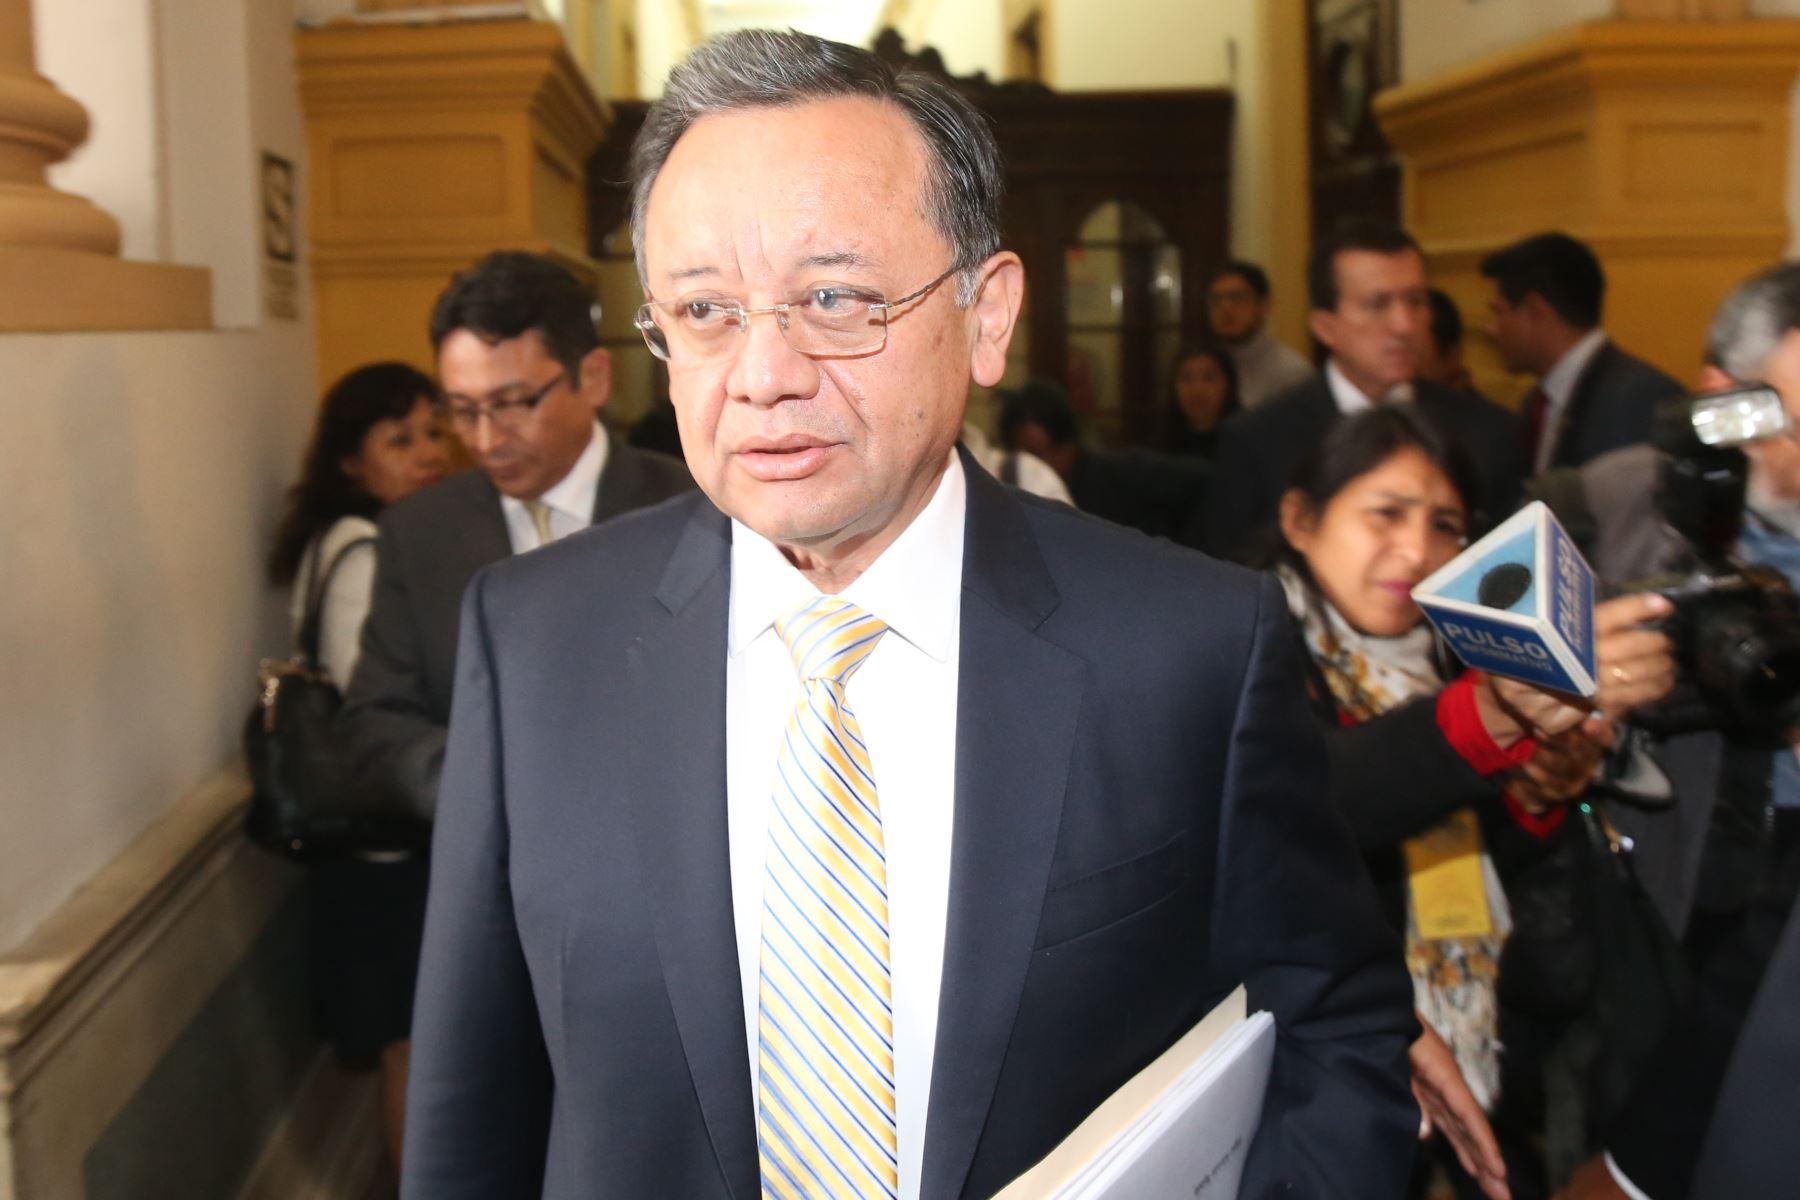 congreso-subcomision-vera-manana-denuncia-constitucional-contra-edgar-alarcon